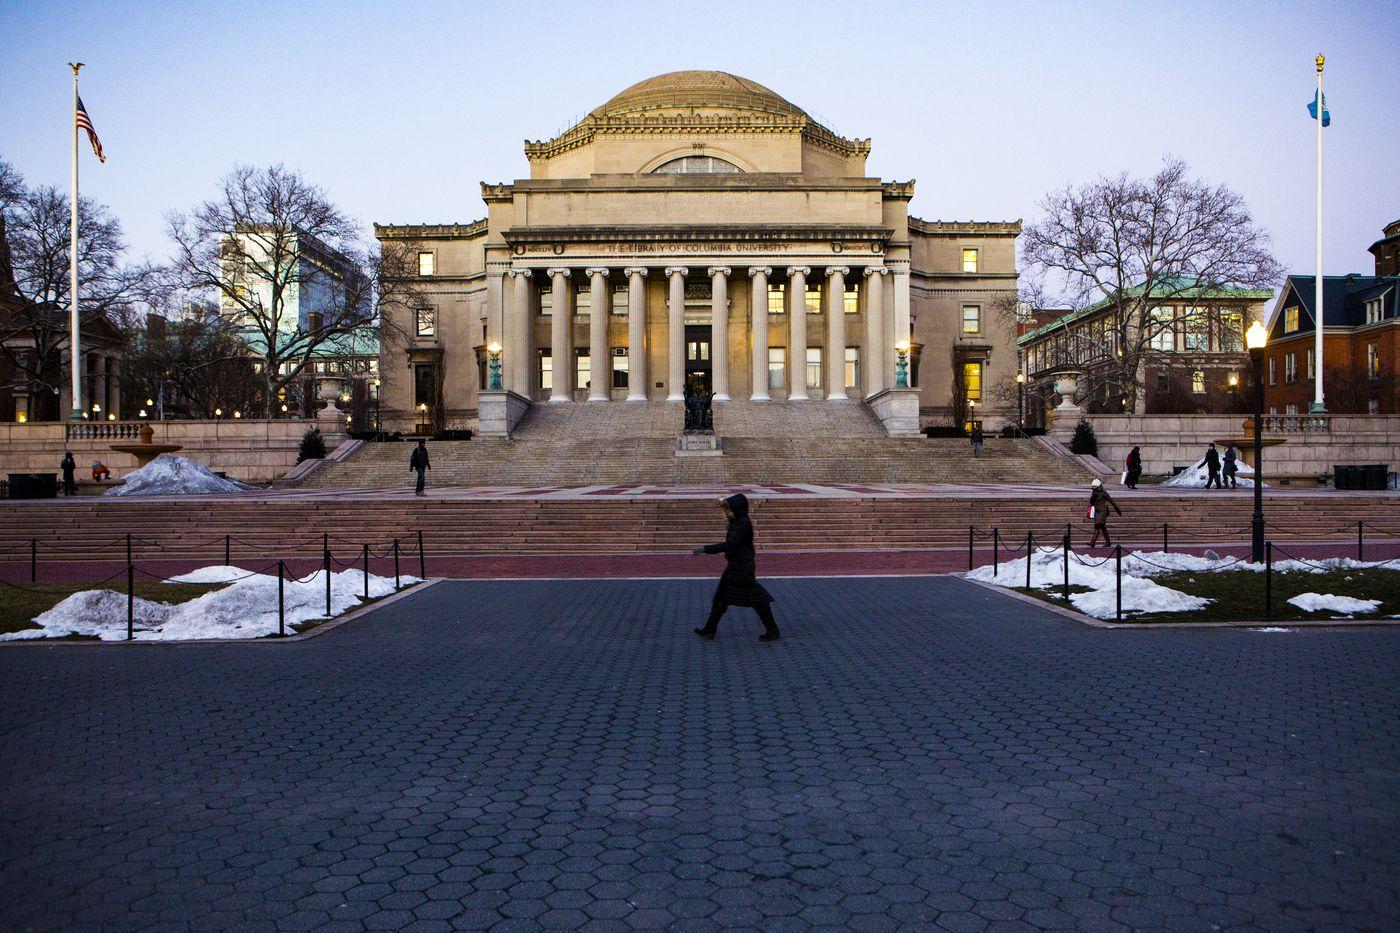 Columbia University hook up è il Kenya ancora dating ragazzo da milionario Matchmaker